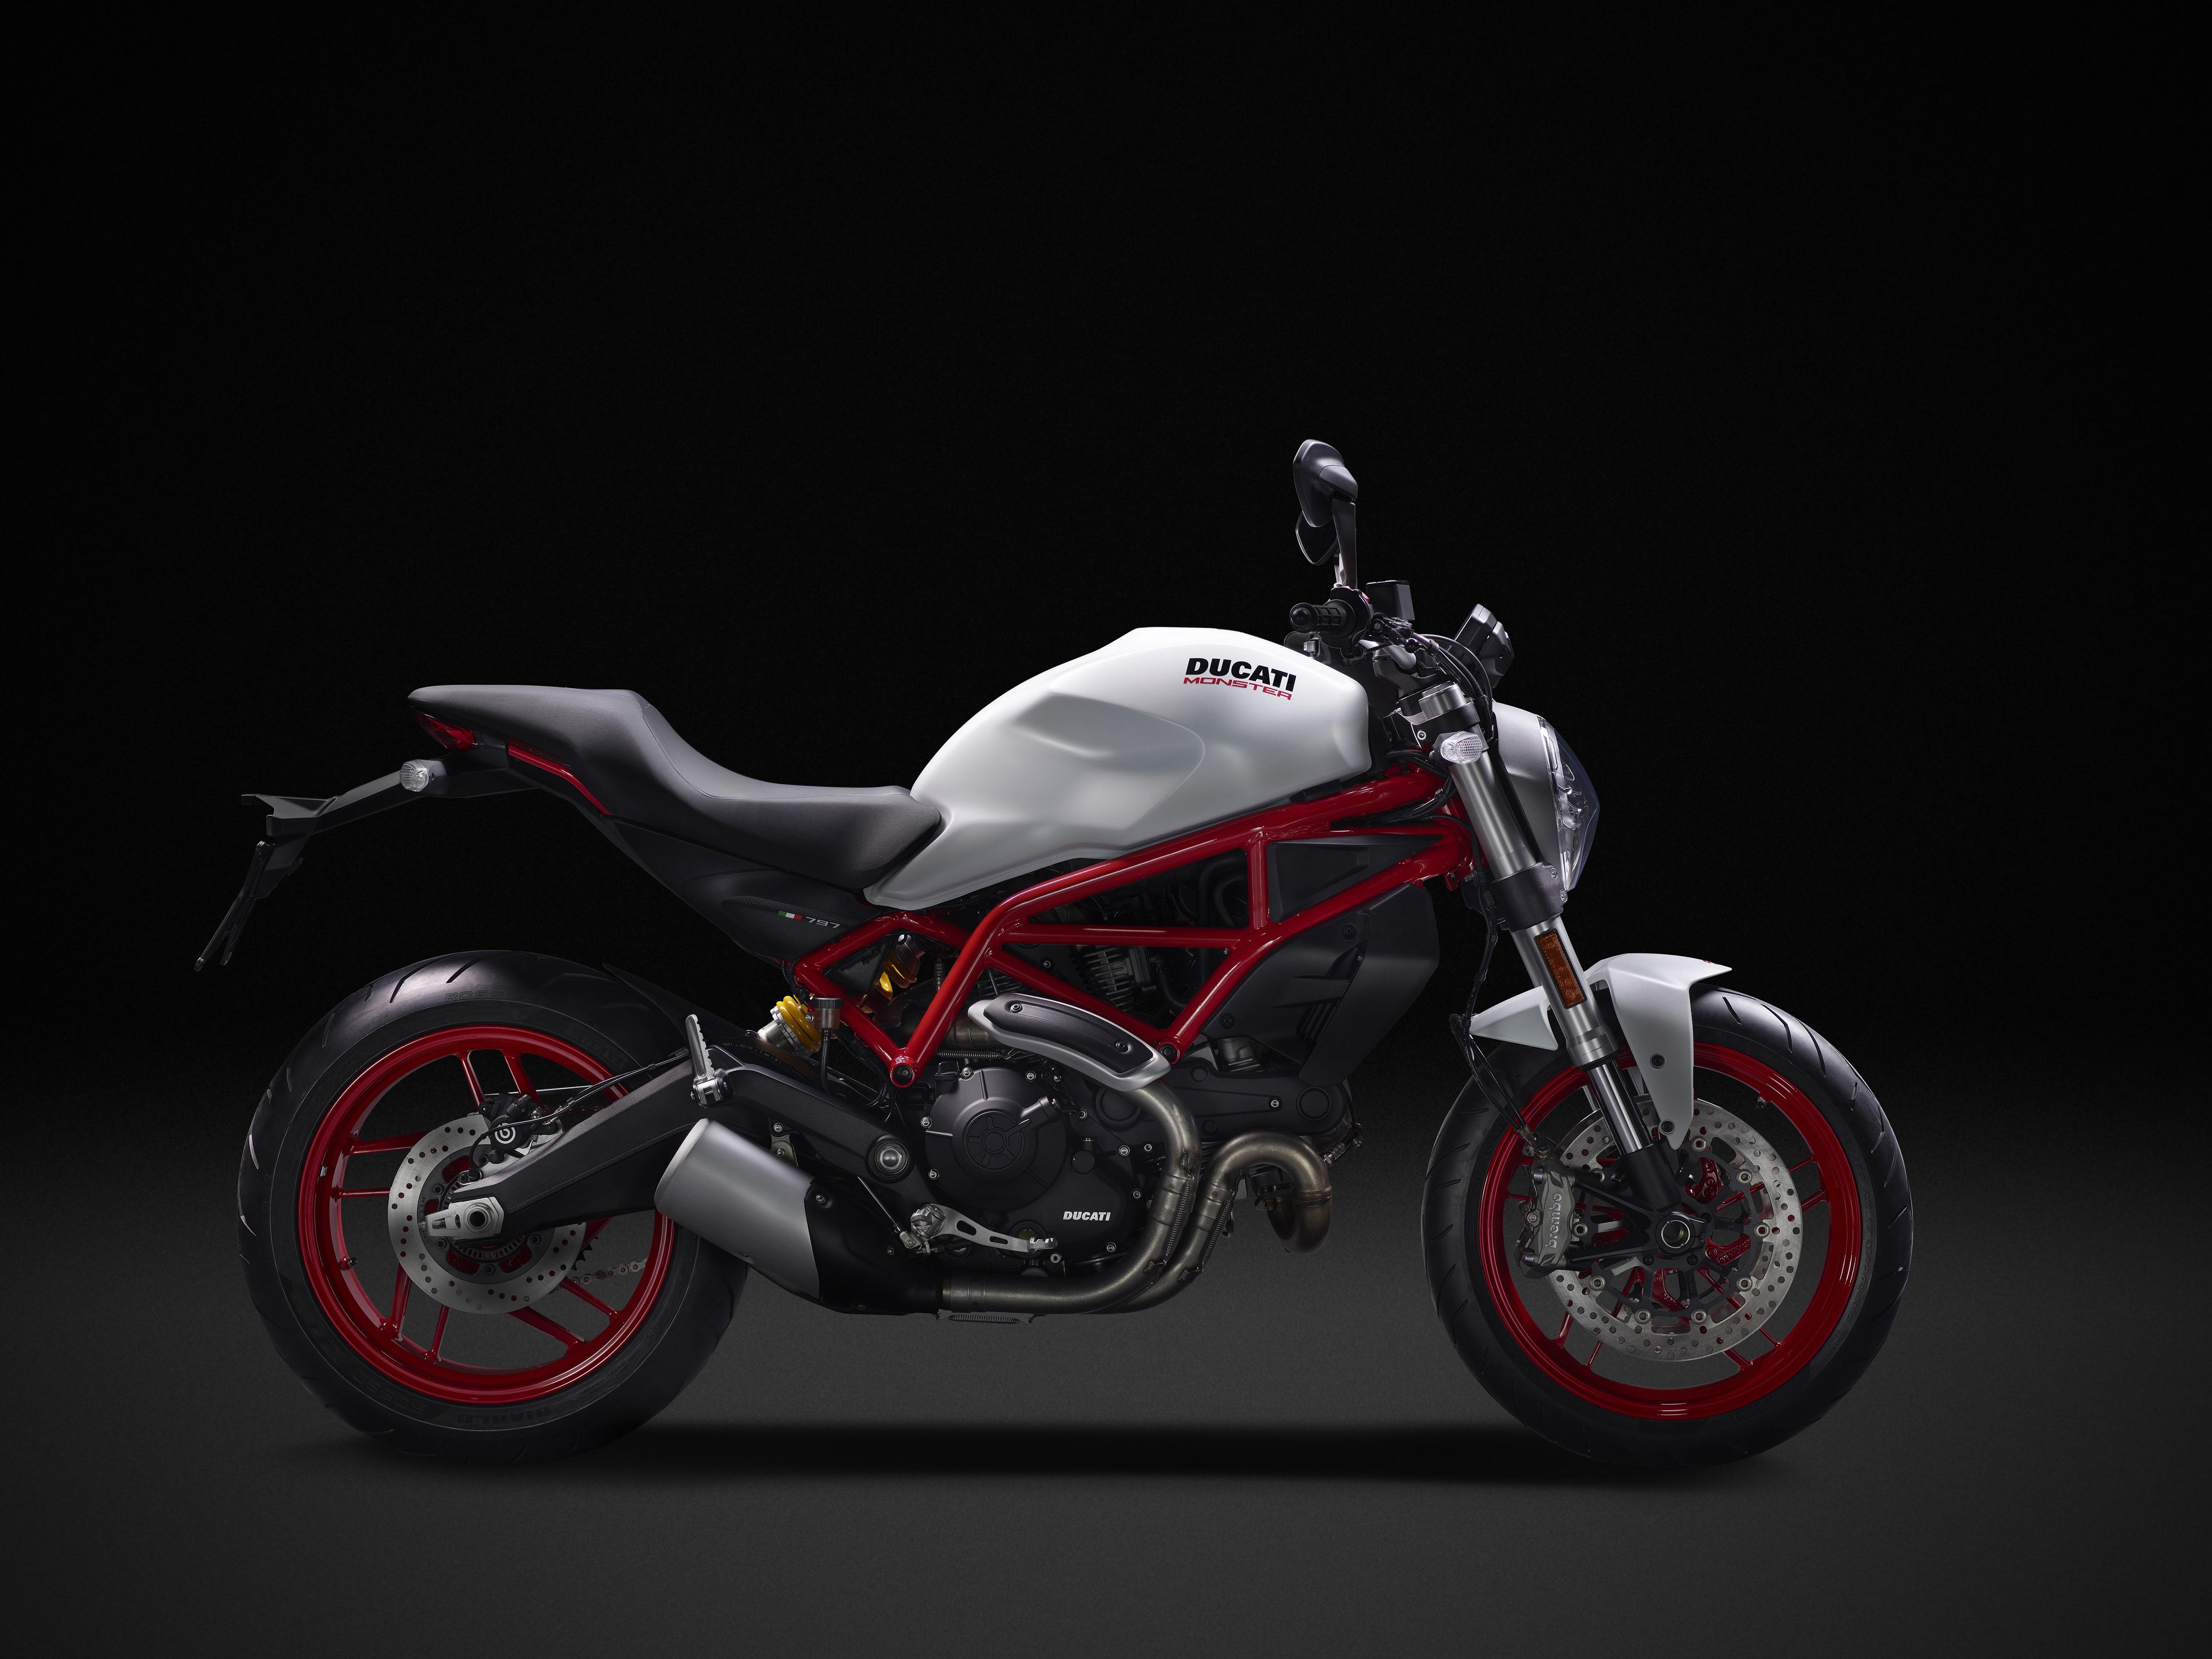 Ducati Monster 797 nuovi modelli 2017